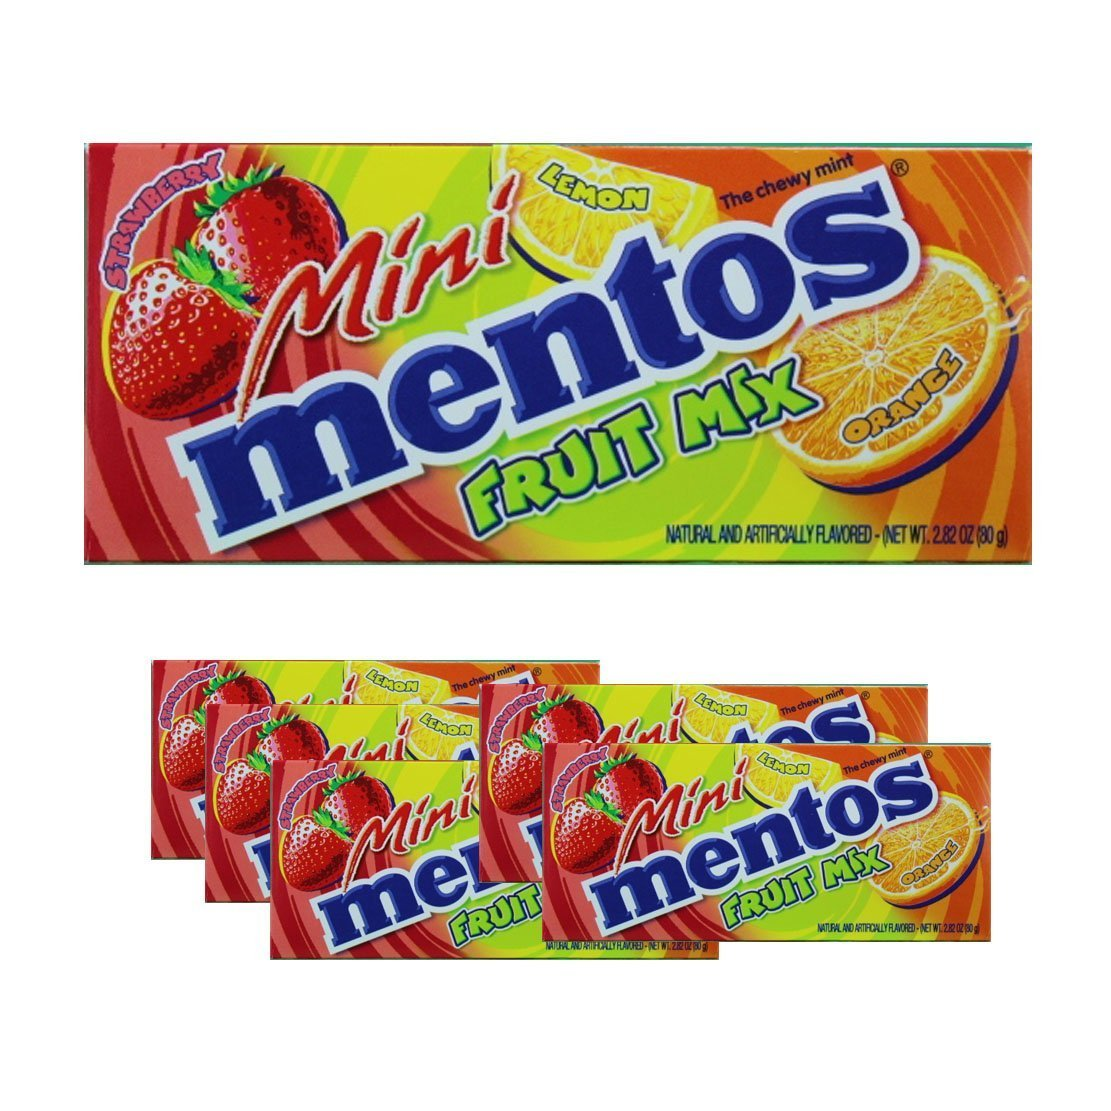 Mini Mentos Fruit Mix 3 Flavors Combo Lemon Orange Strawberry of 2.82 - 6 Packs by Mentos